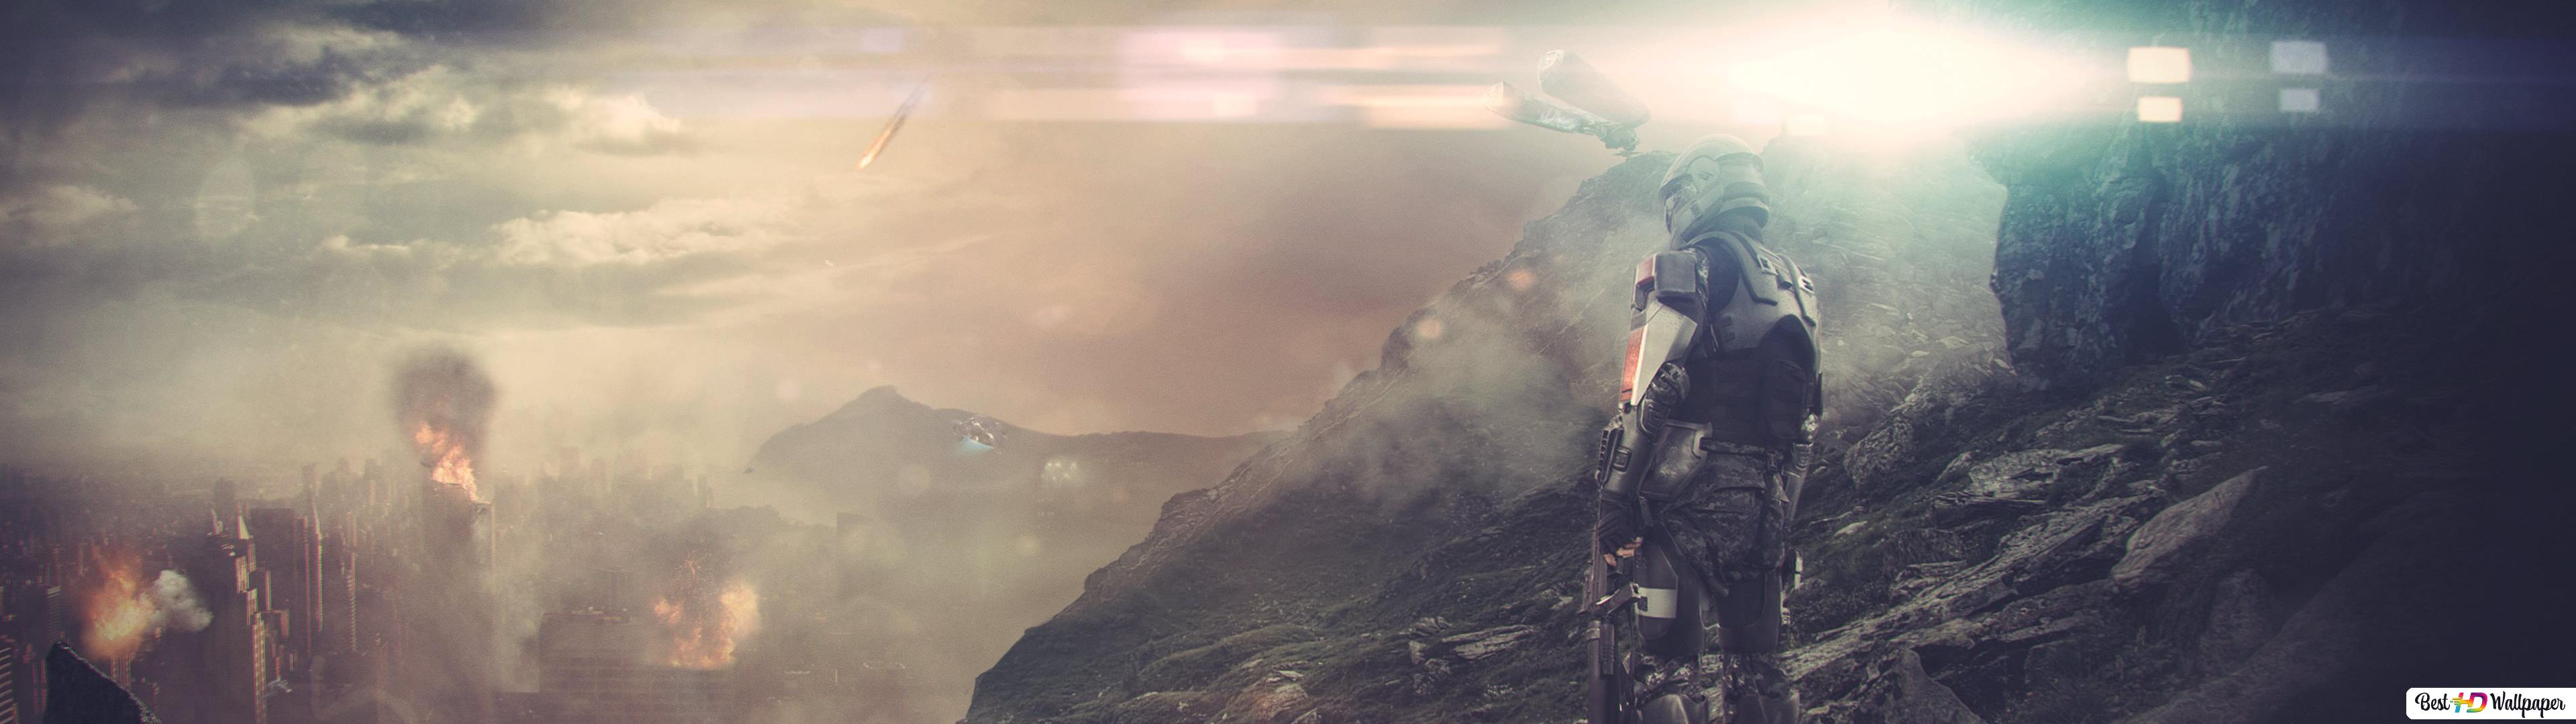 Halo 3 Odst Hd Wallpaper Download